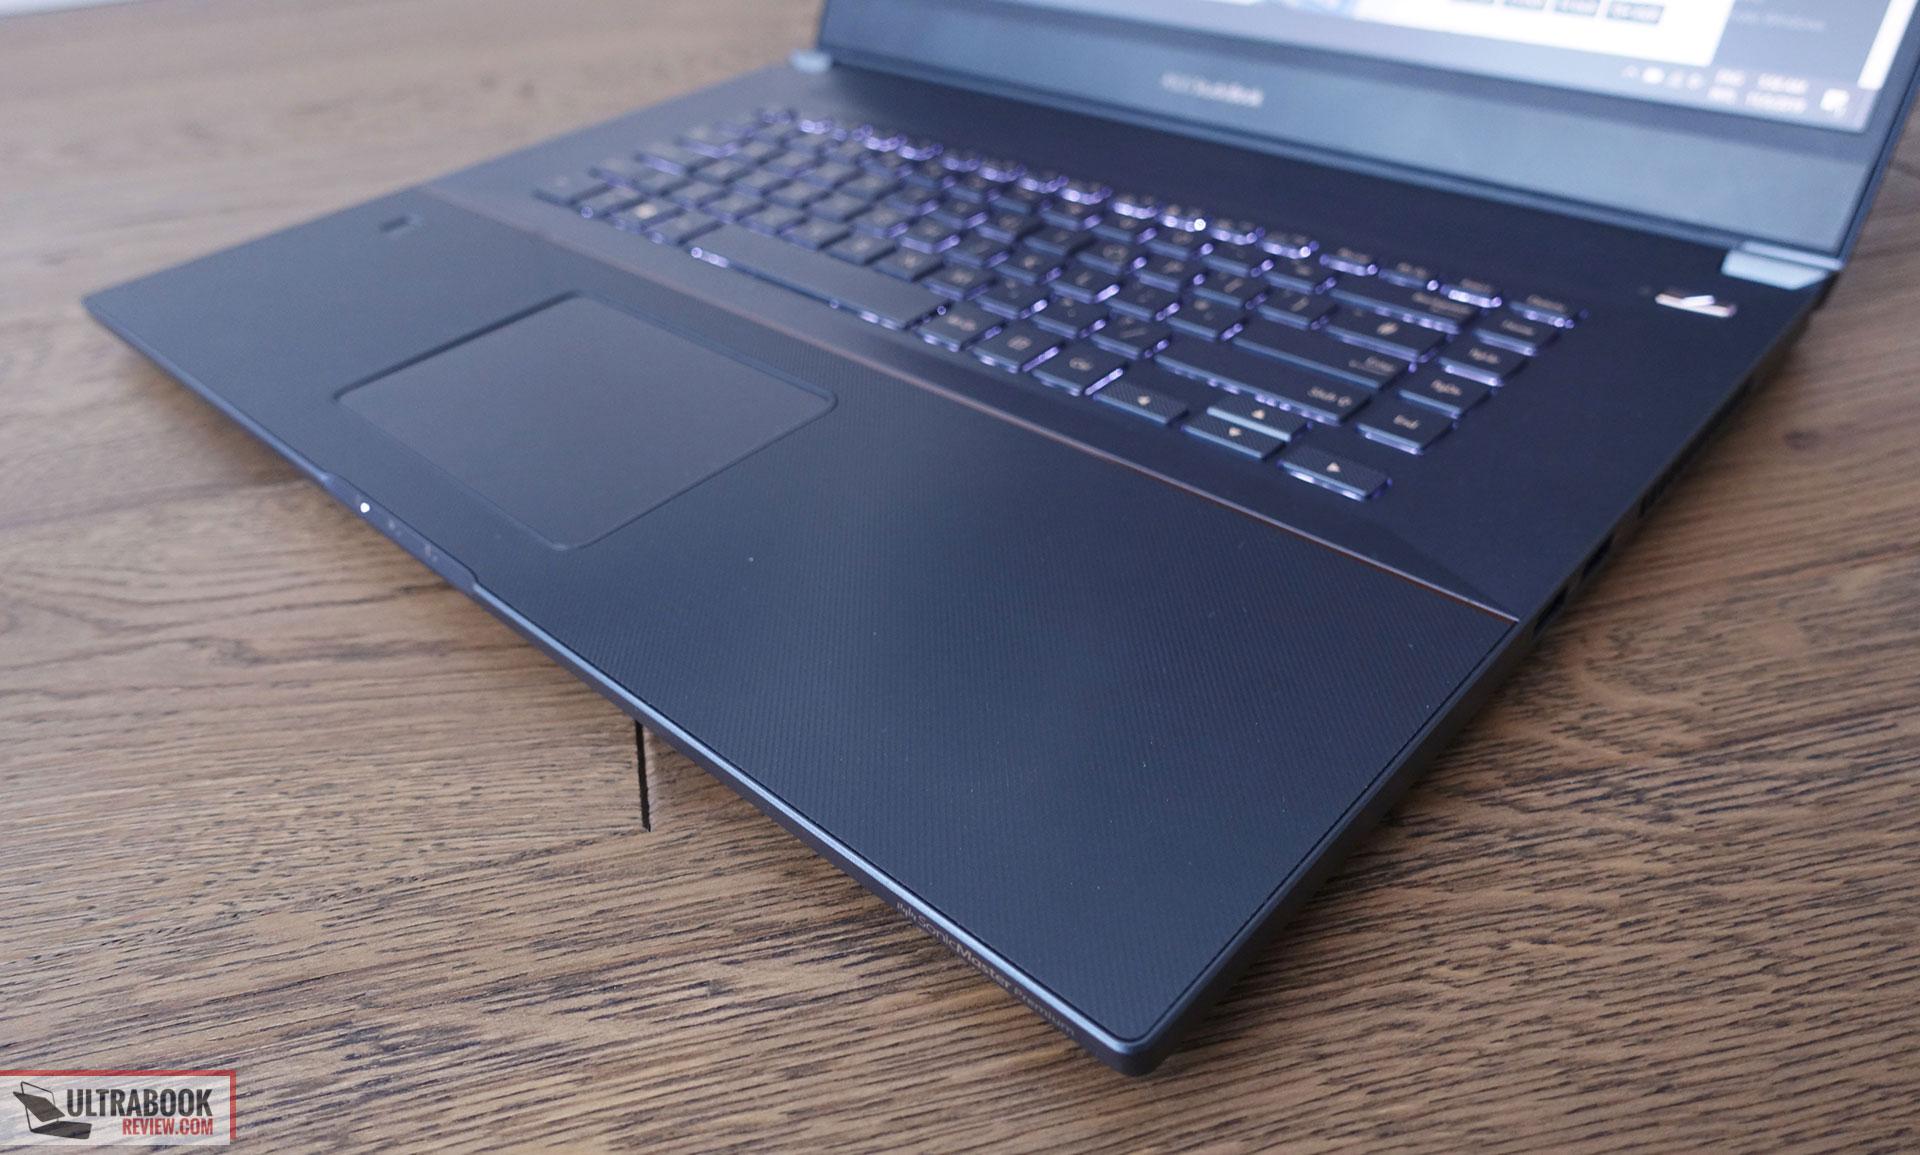 exterAsus StudioBook Pro W700 - interior